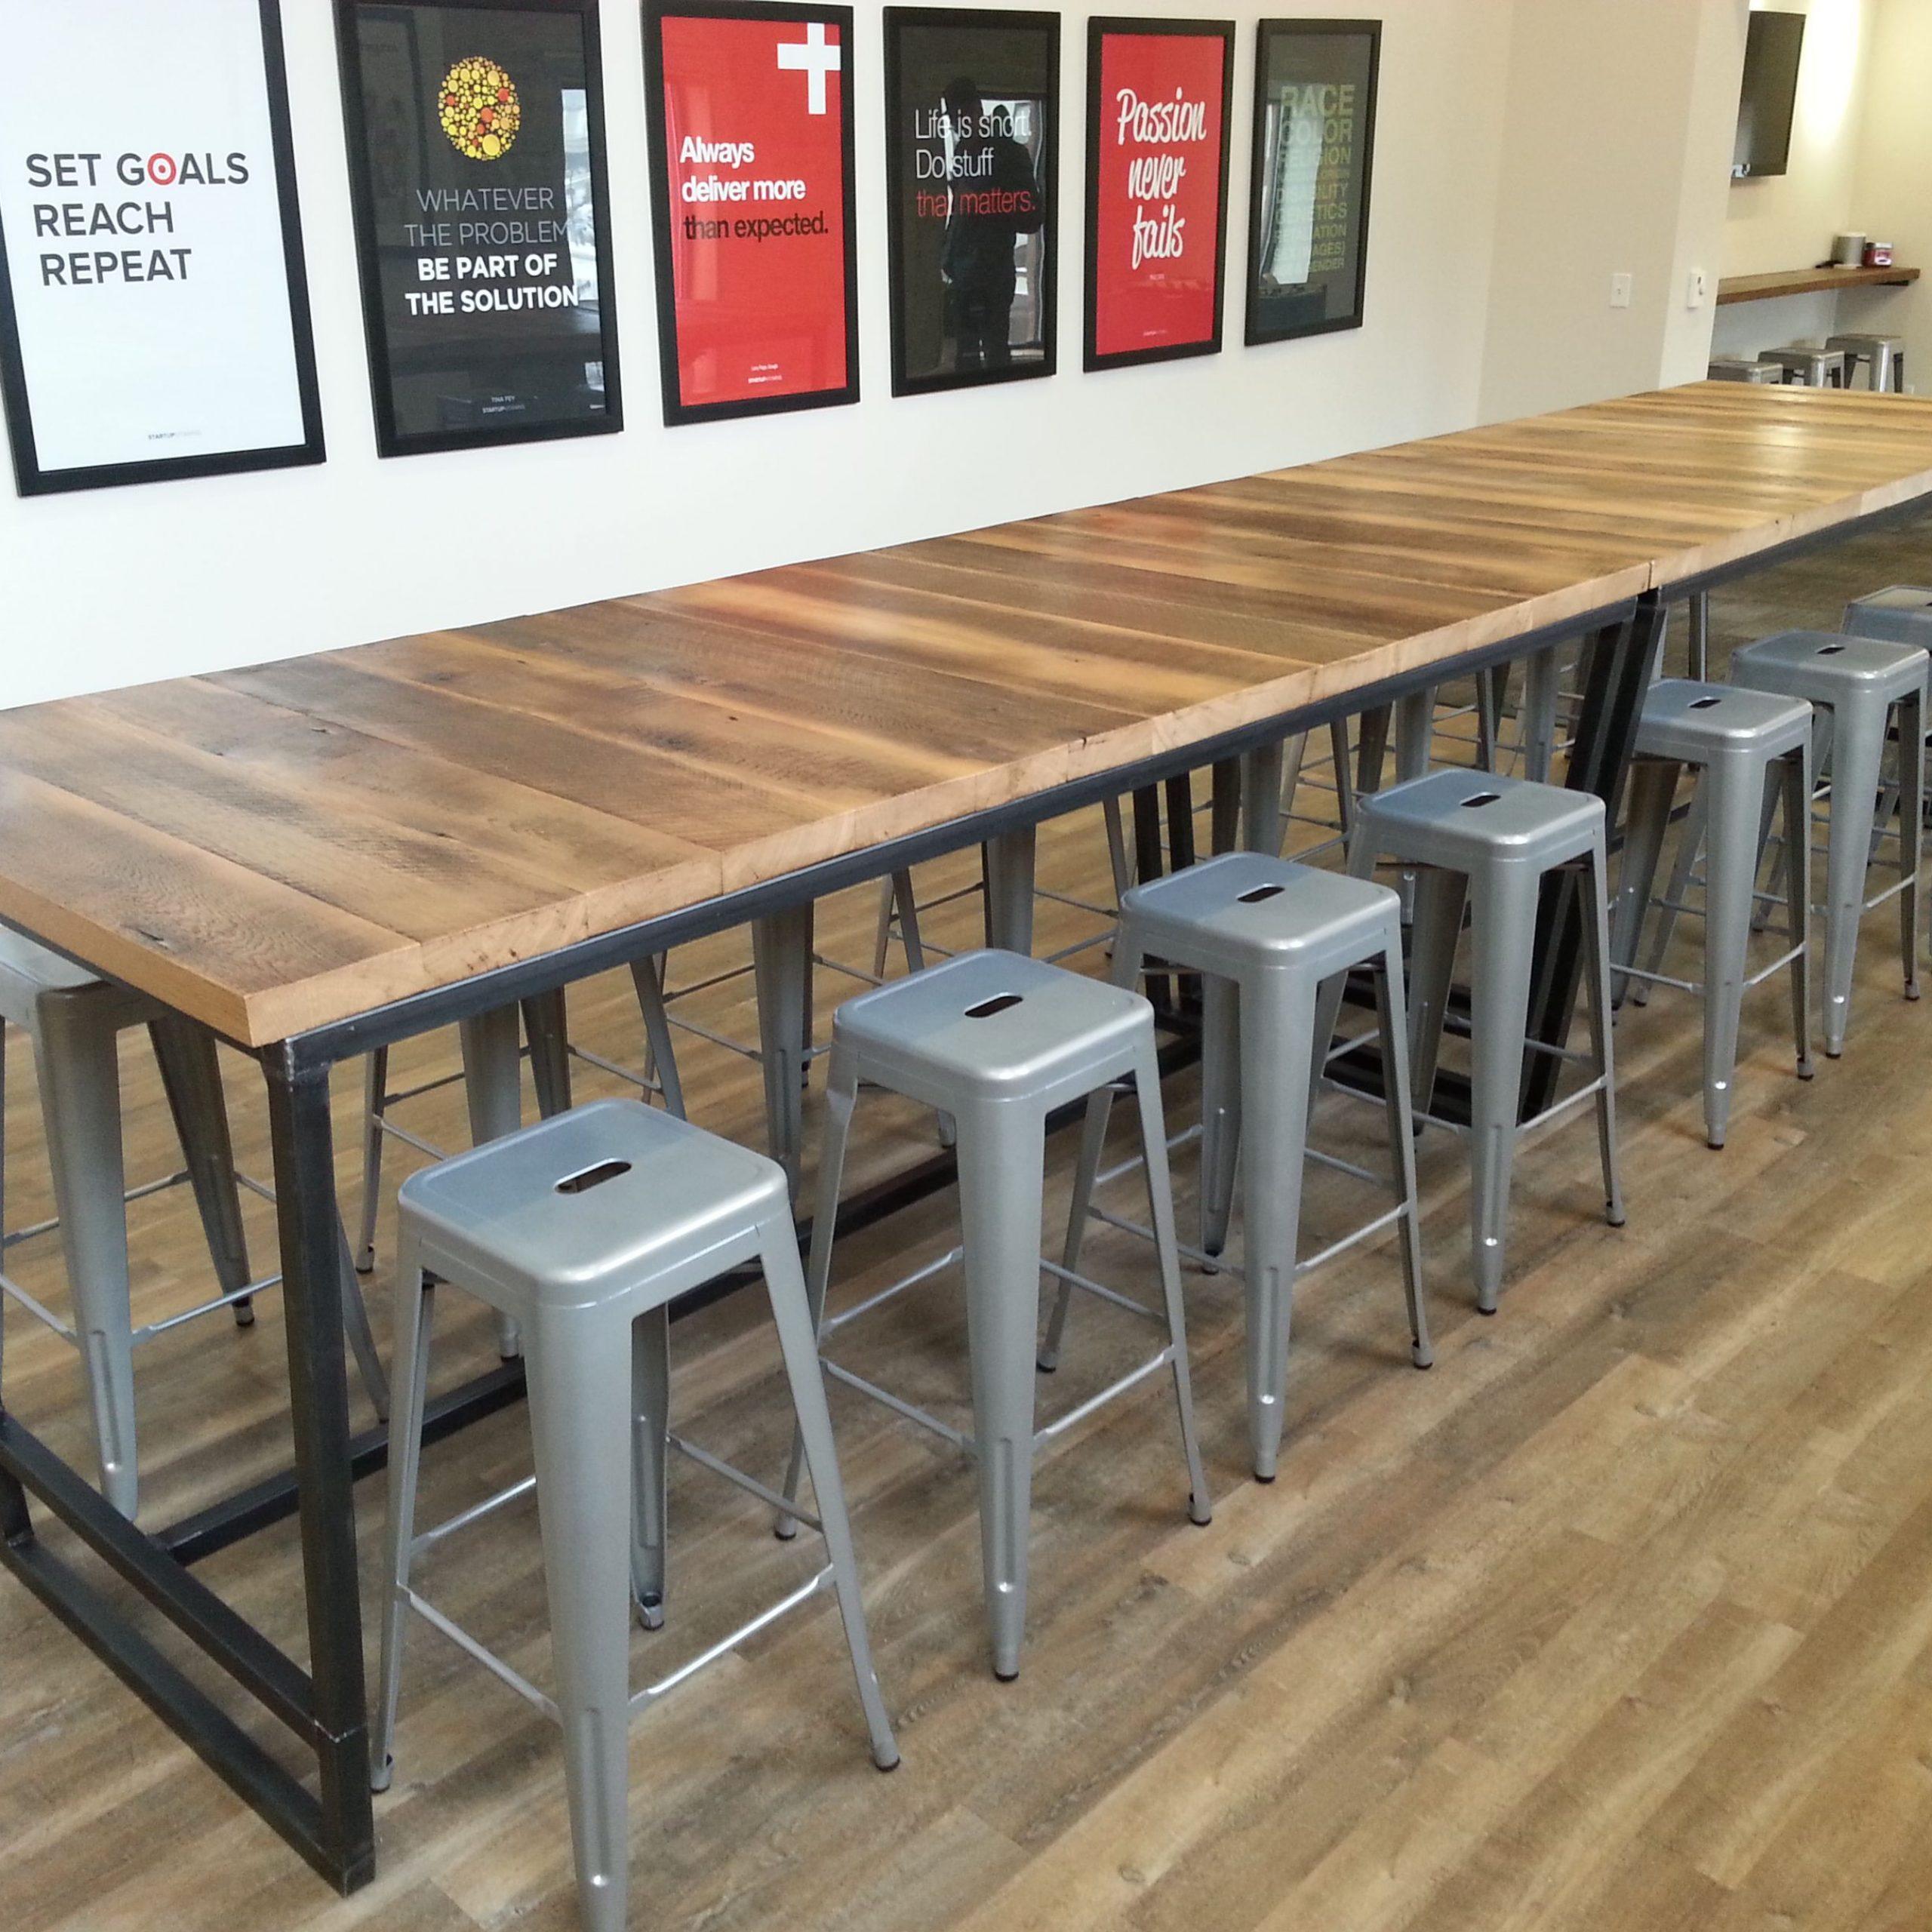 Famous Reclaimed Wood High Table #lv83 – Advancedmassagebysara Regarding 2018 Griffin Reclaimed Wood Bar Height Tables (View 22 of 25)